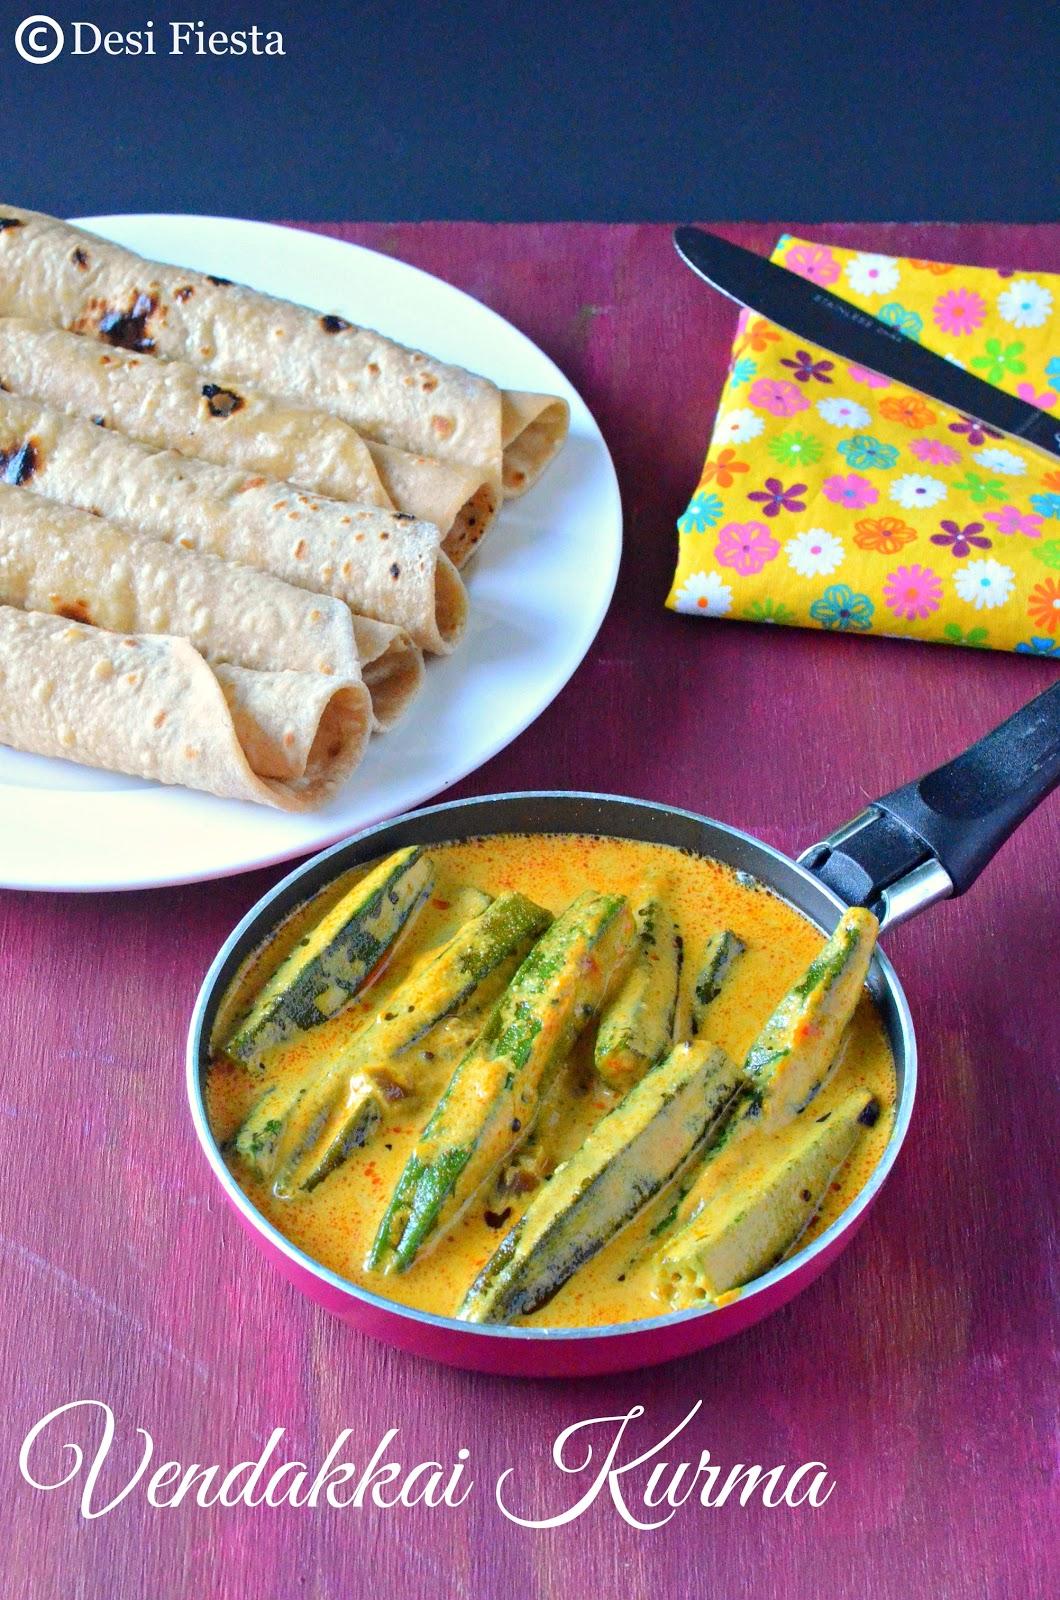 Bhindi recipes